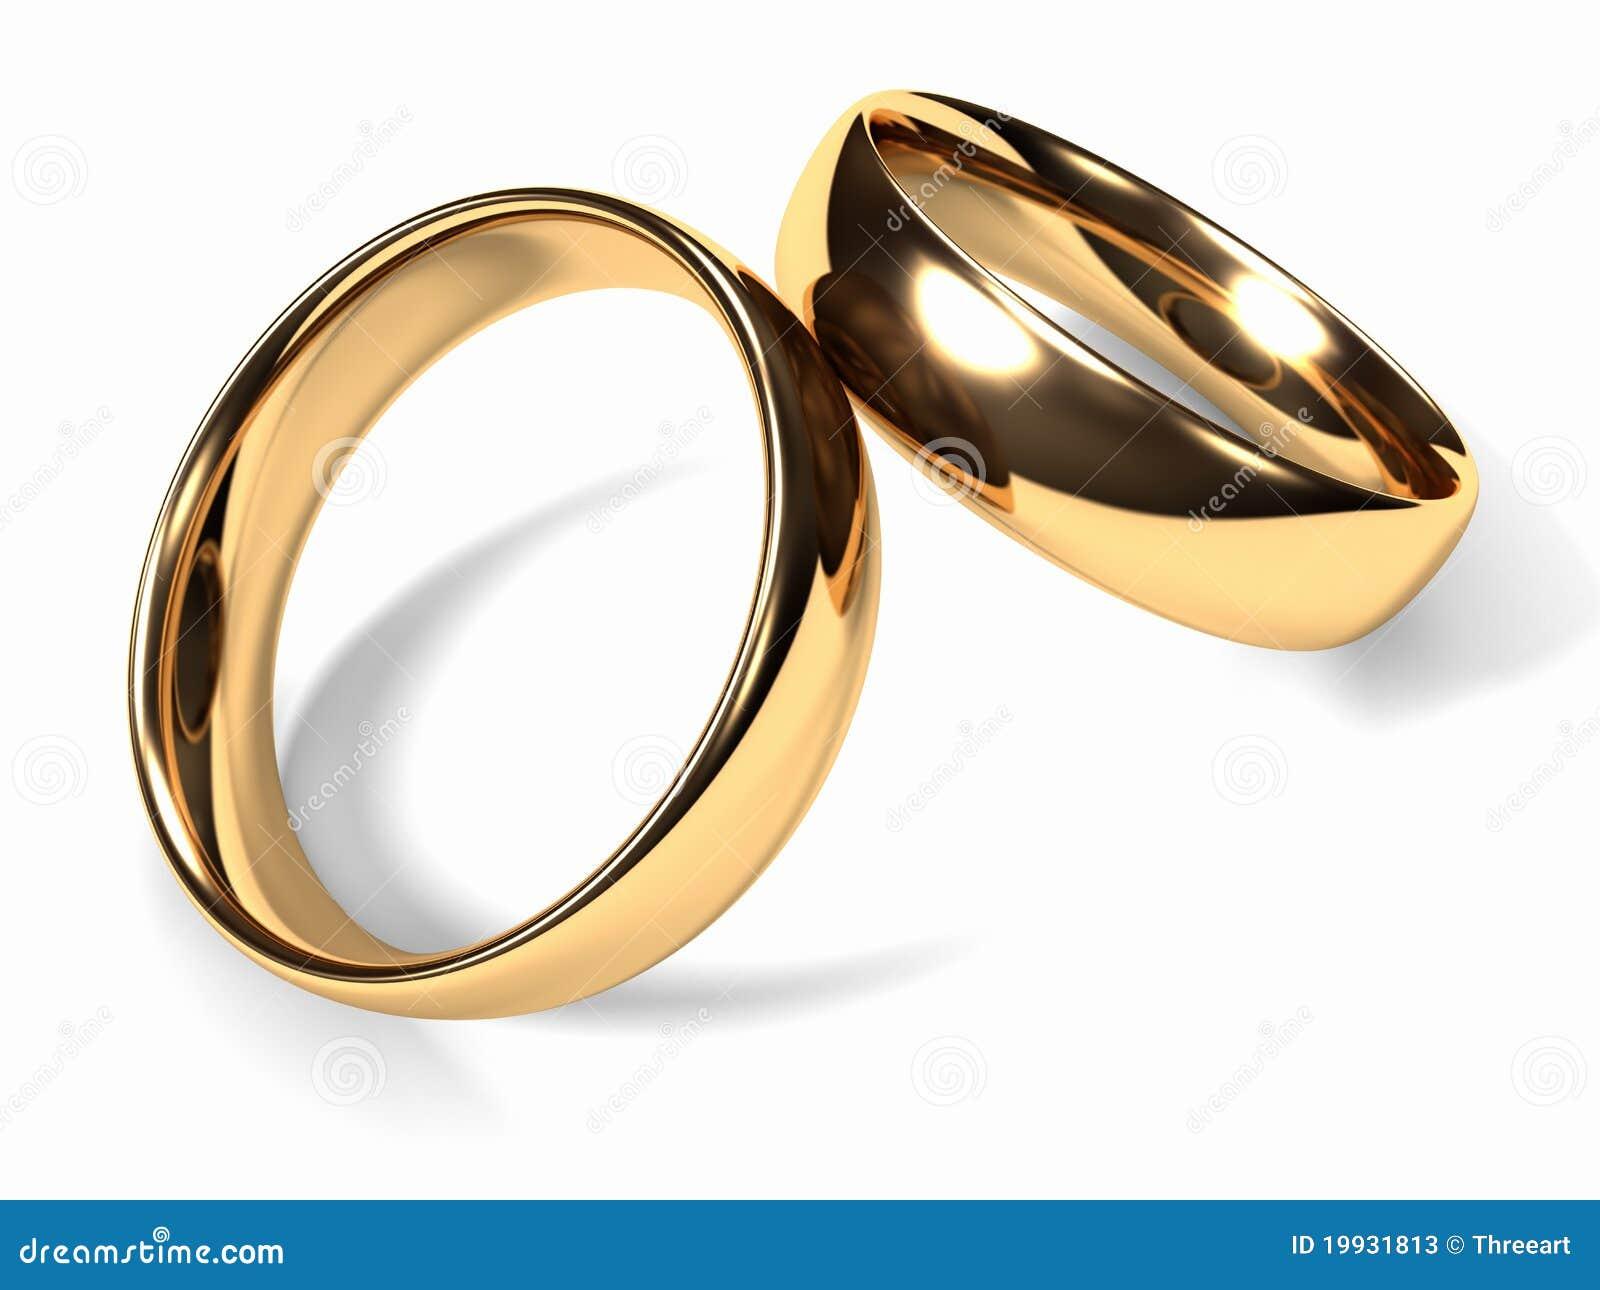 wedding rings stock photos image 19931813